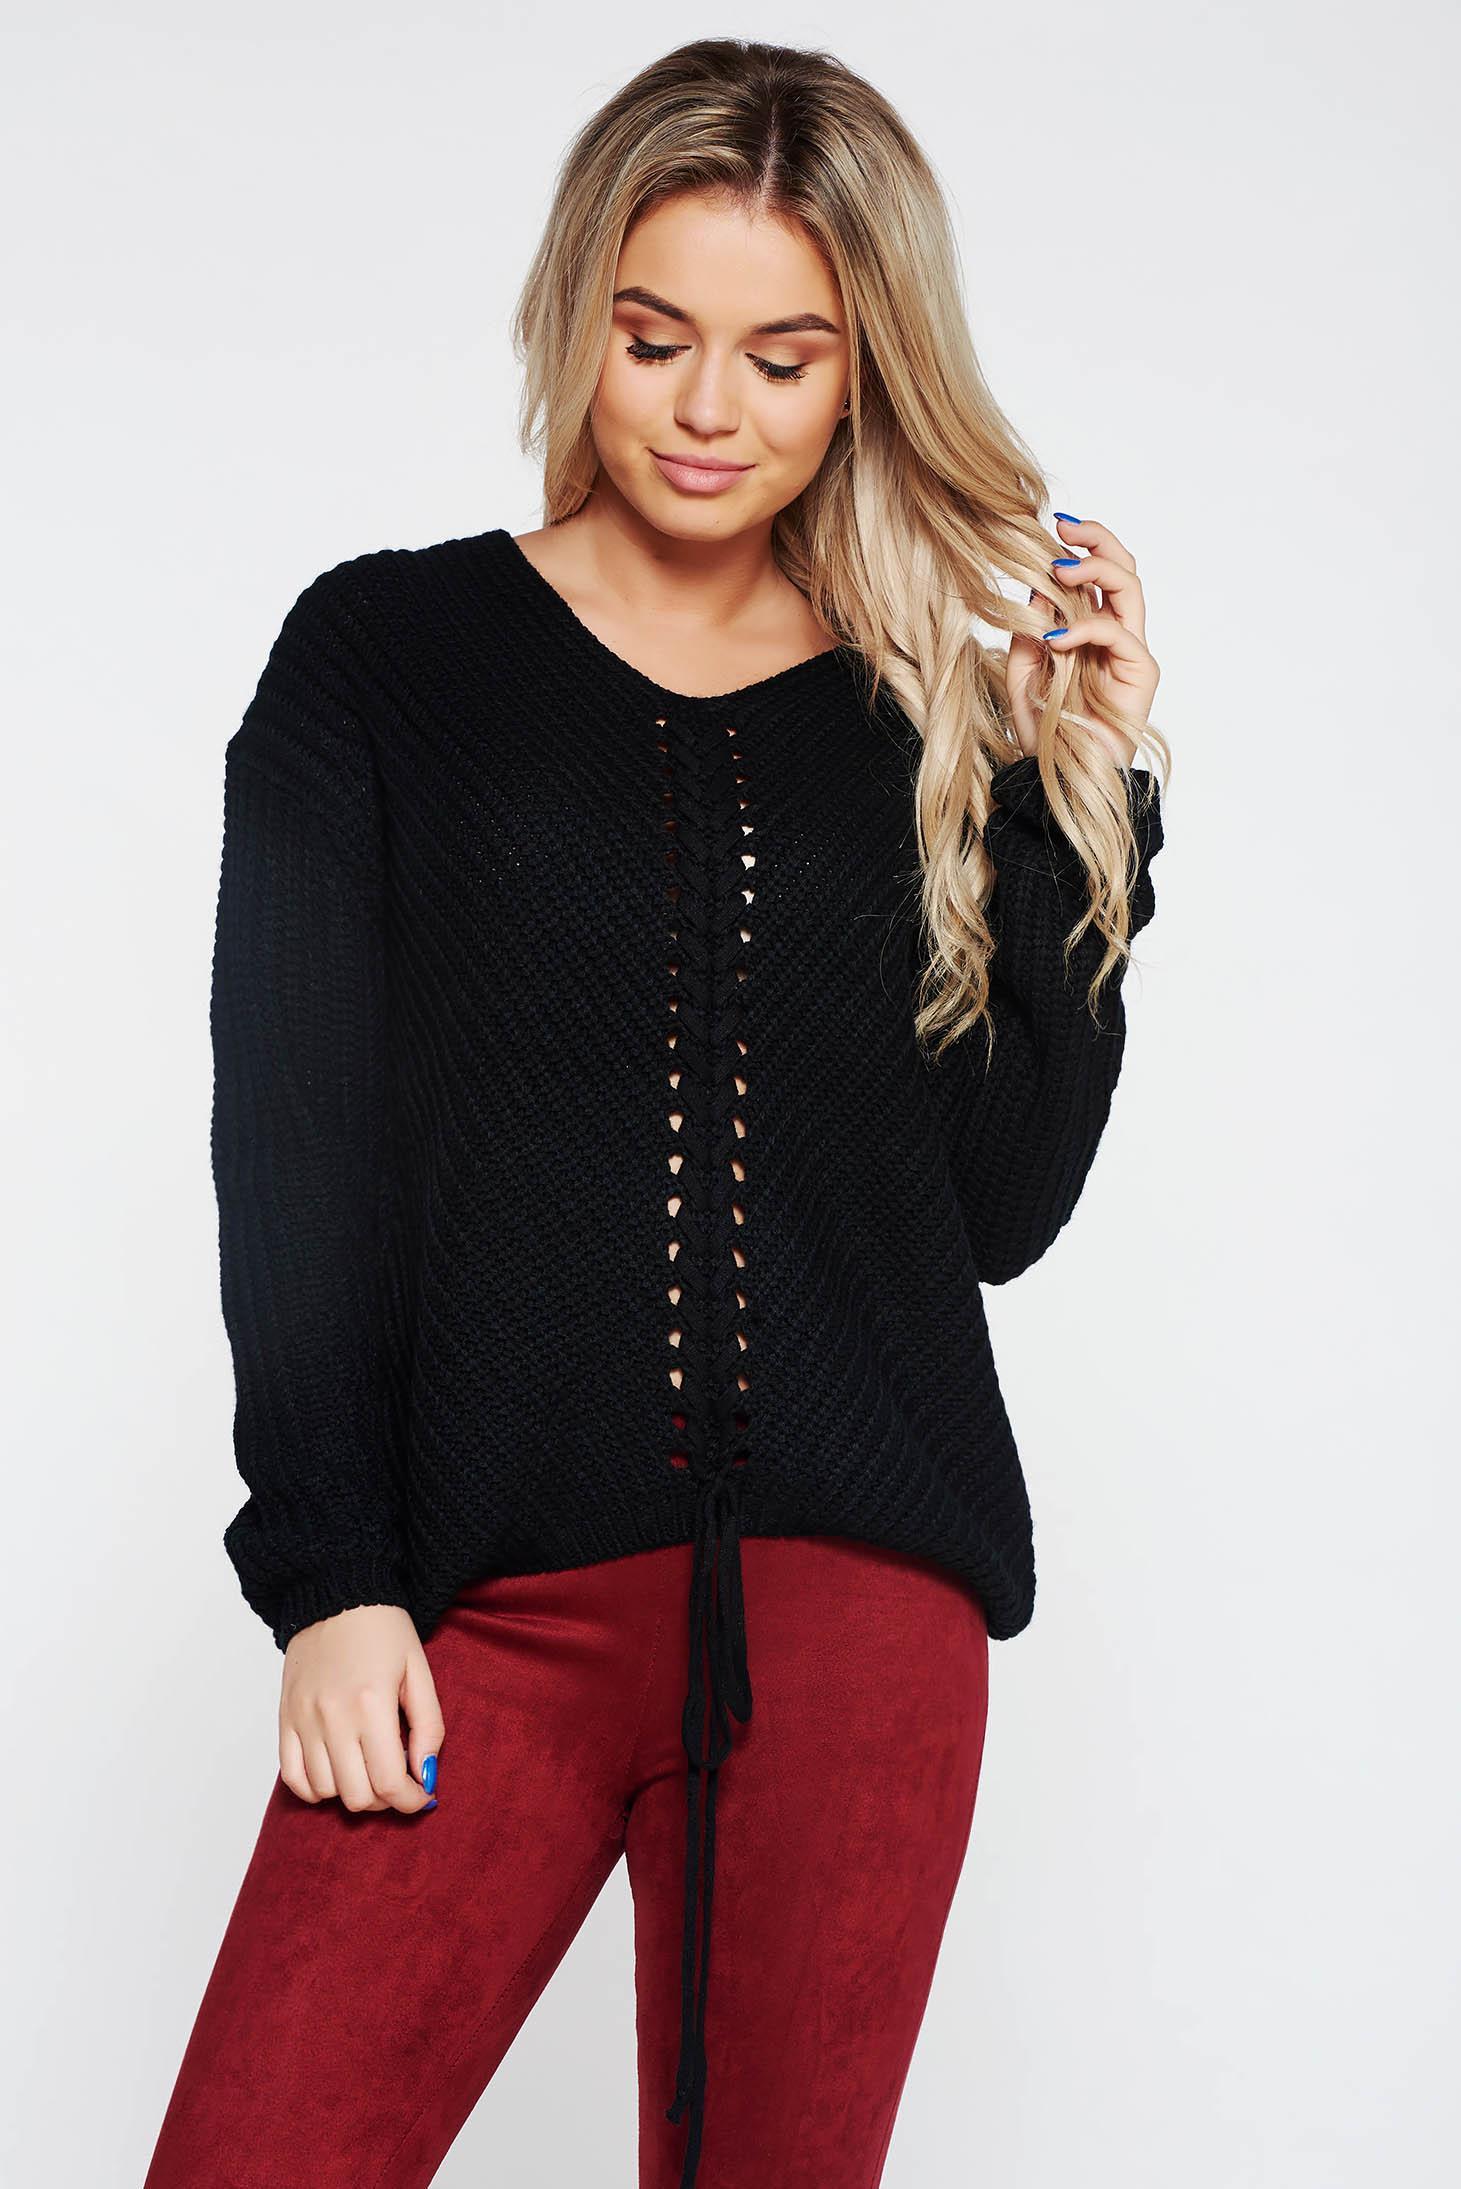 Pulover SunShine negru casual cu croi larg din material tricotat accesorizat cu snur